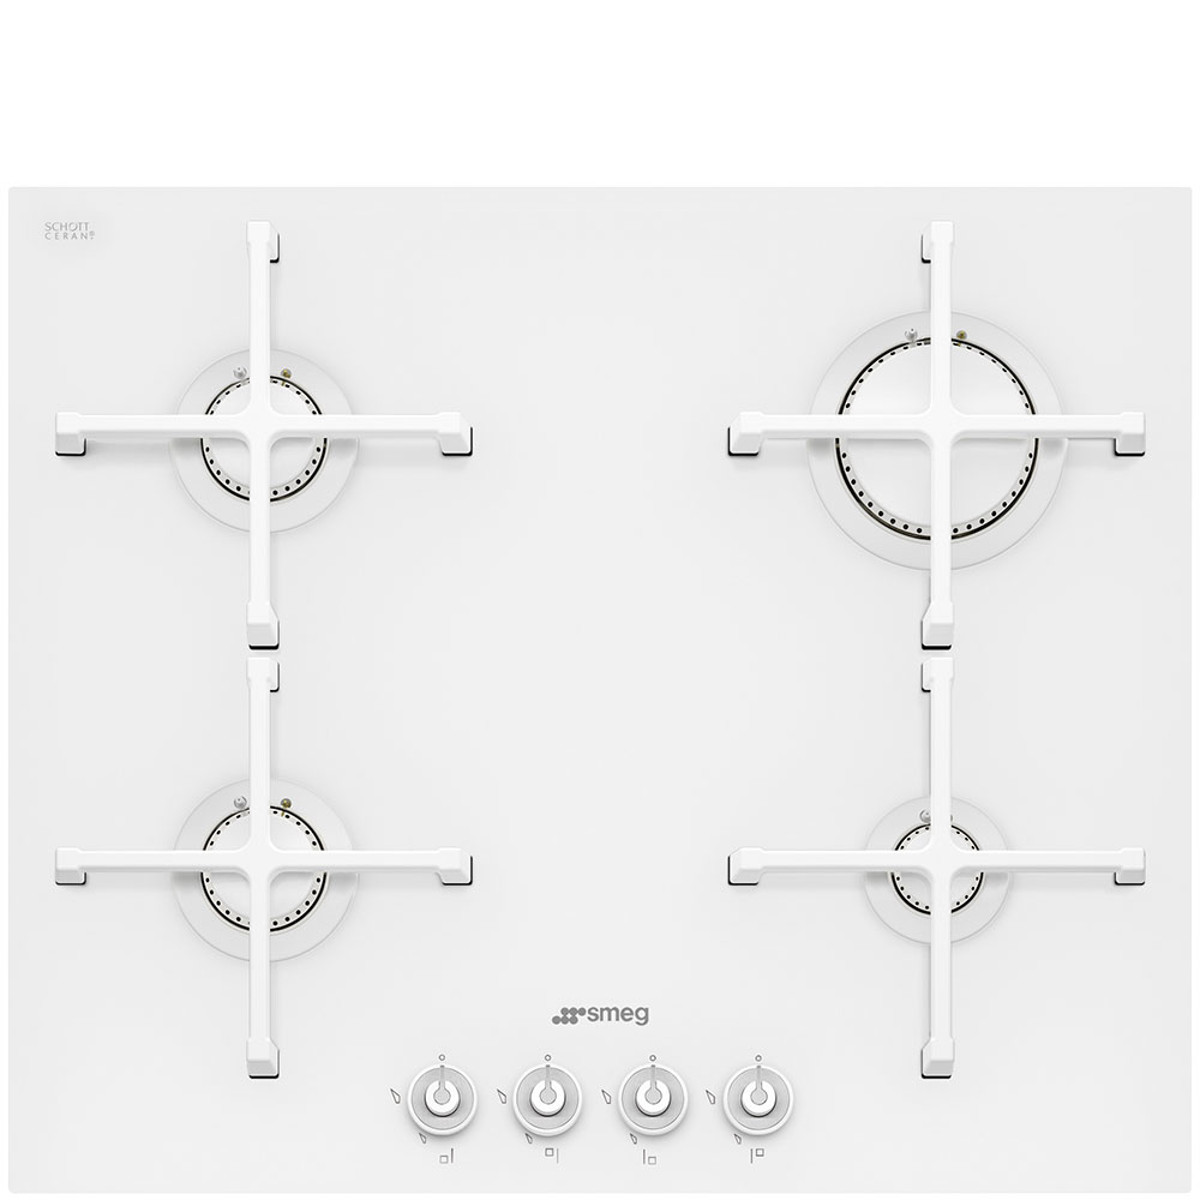 Smeg PV164CB 60cm Linea Ultra-low Profile Gas on Glass Ceramic Hob, White